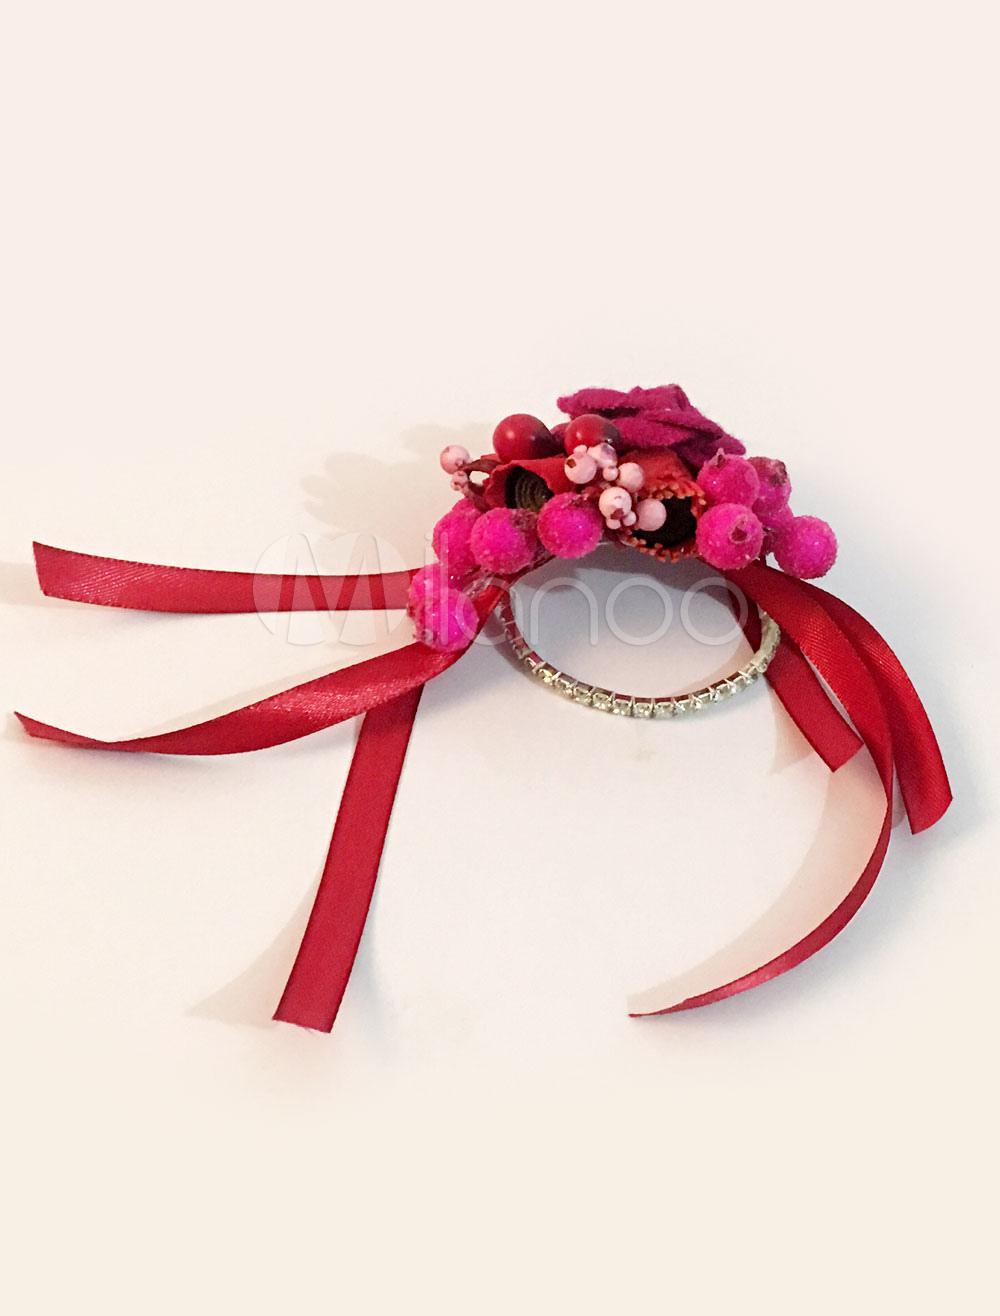 Wedding Wrist Corsage Bracelet Rhinestones Bridesmaid Red Silk Flowers Ribbon Prom Corsage